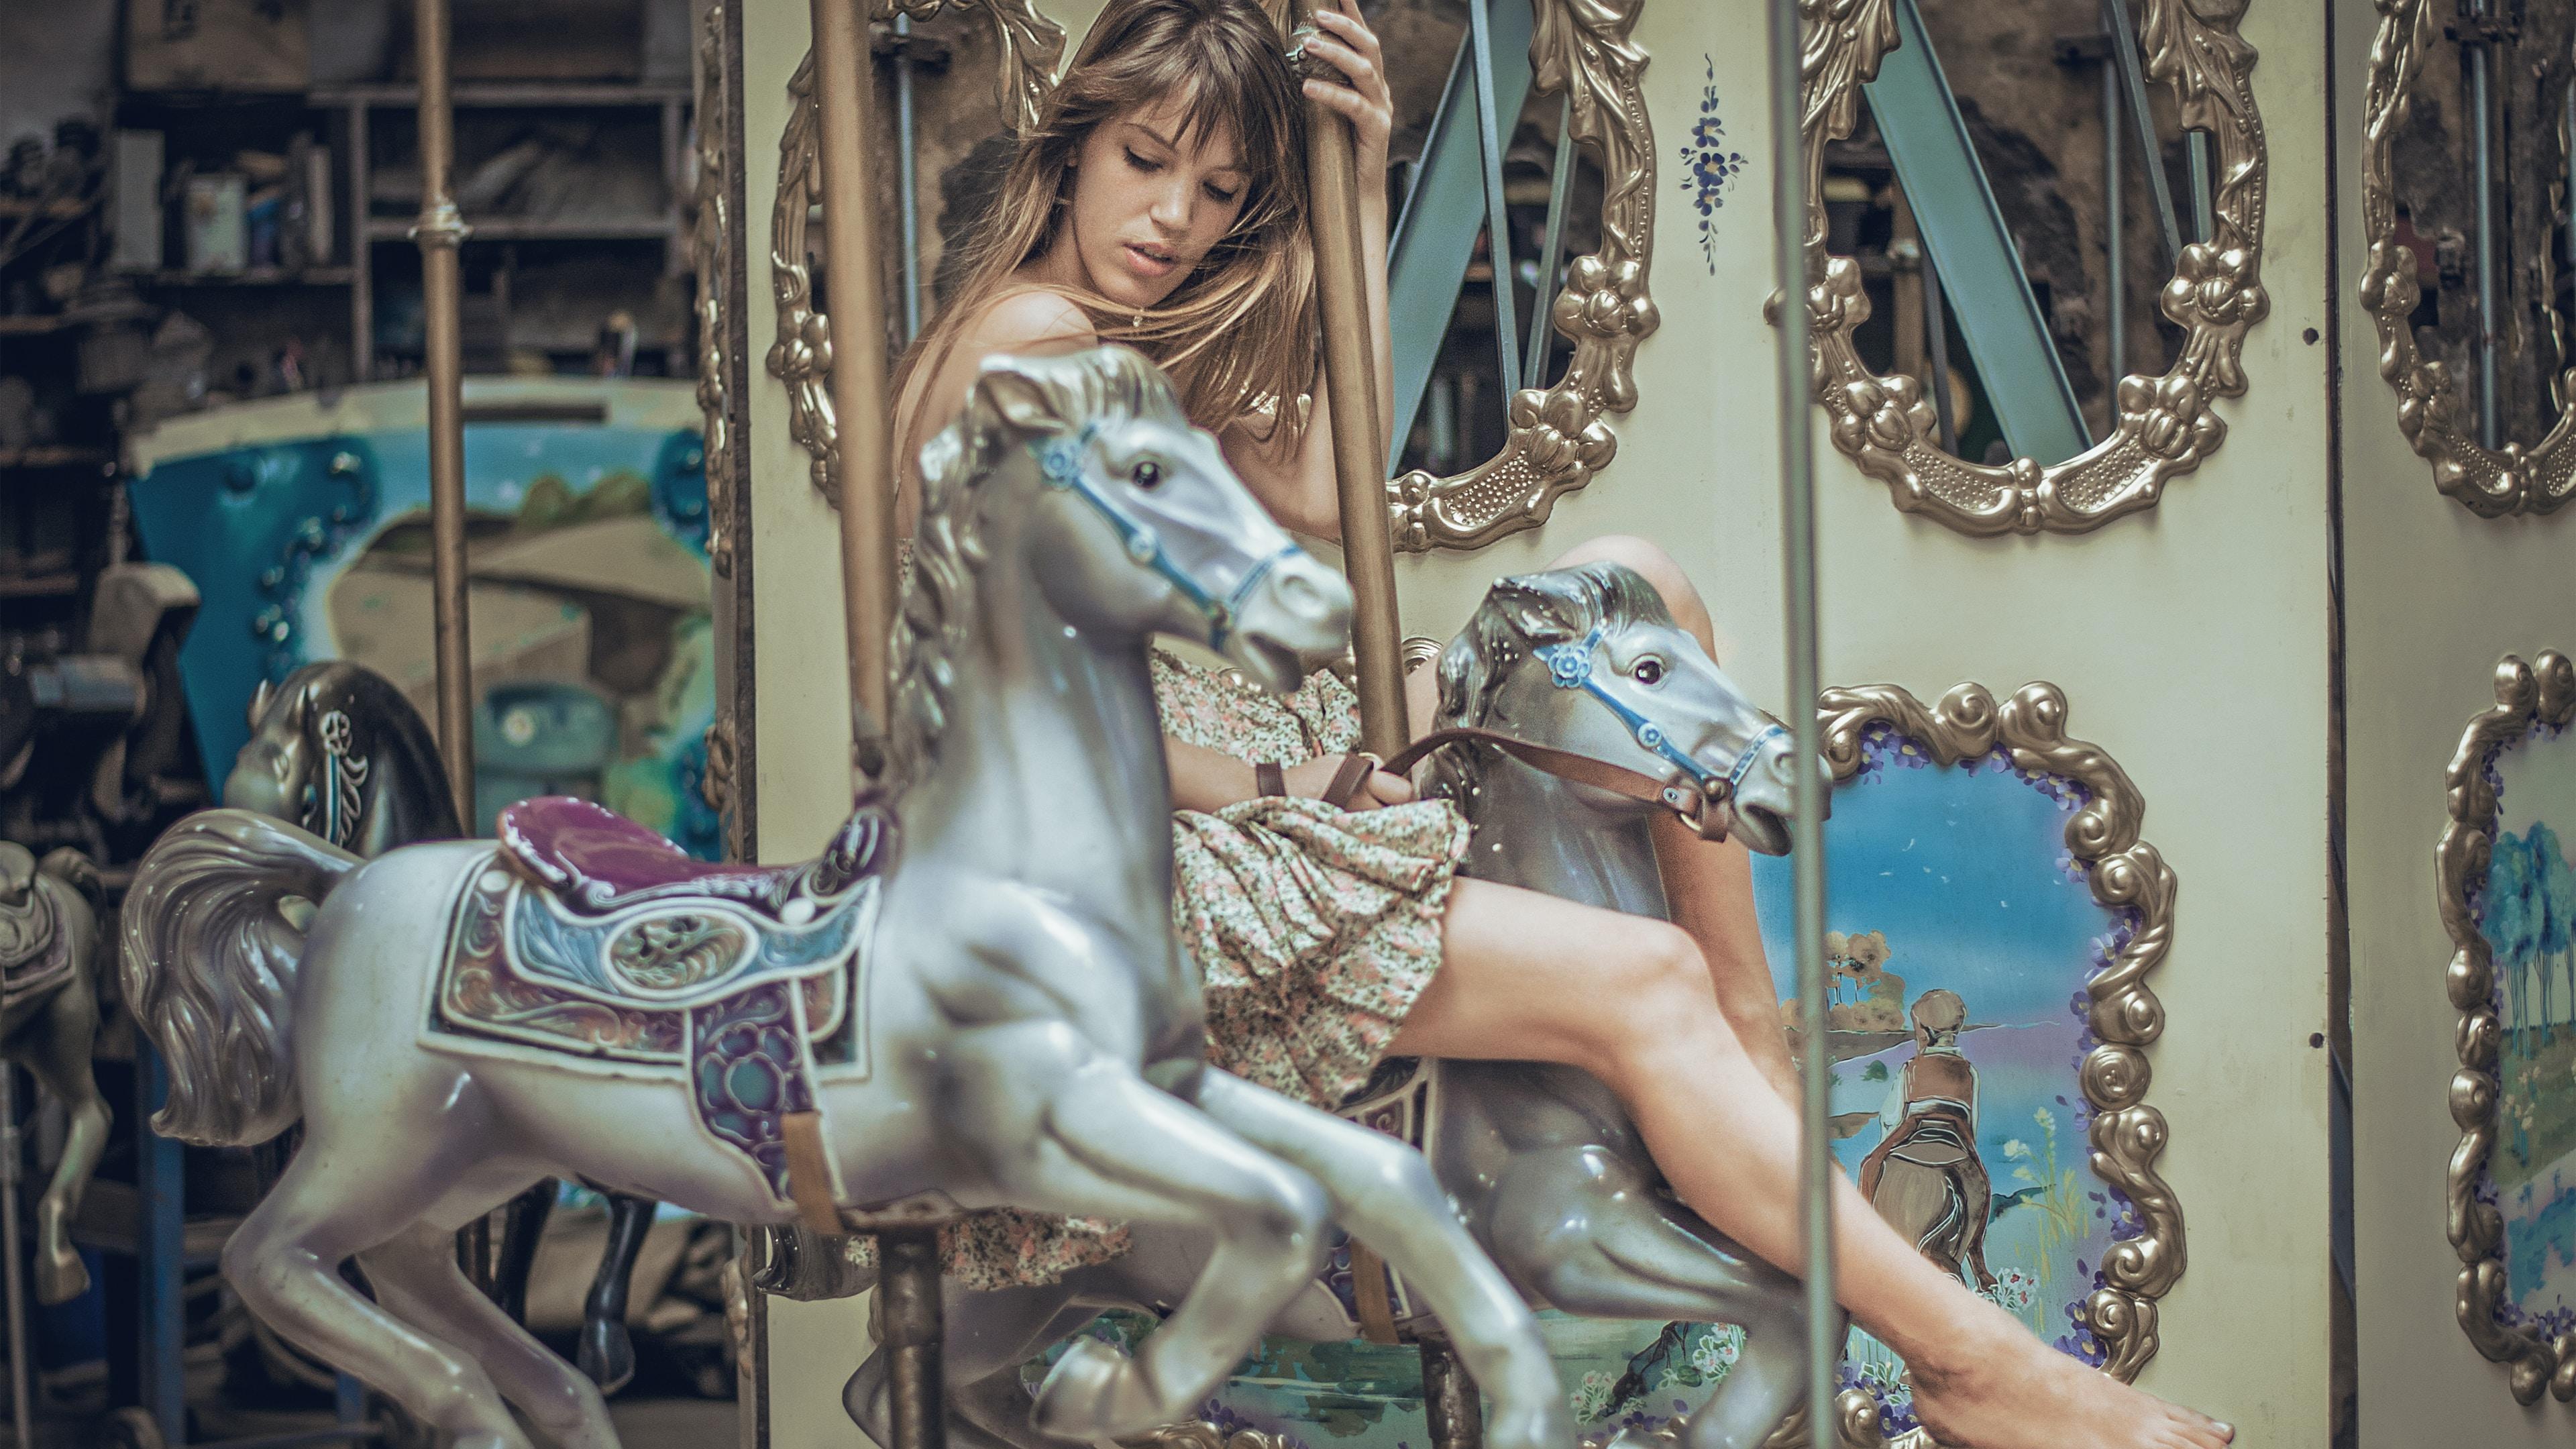 woman riding horse carousel